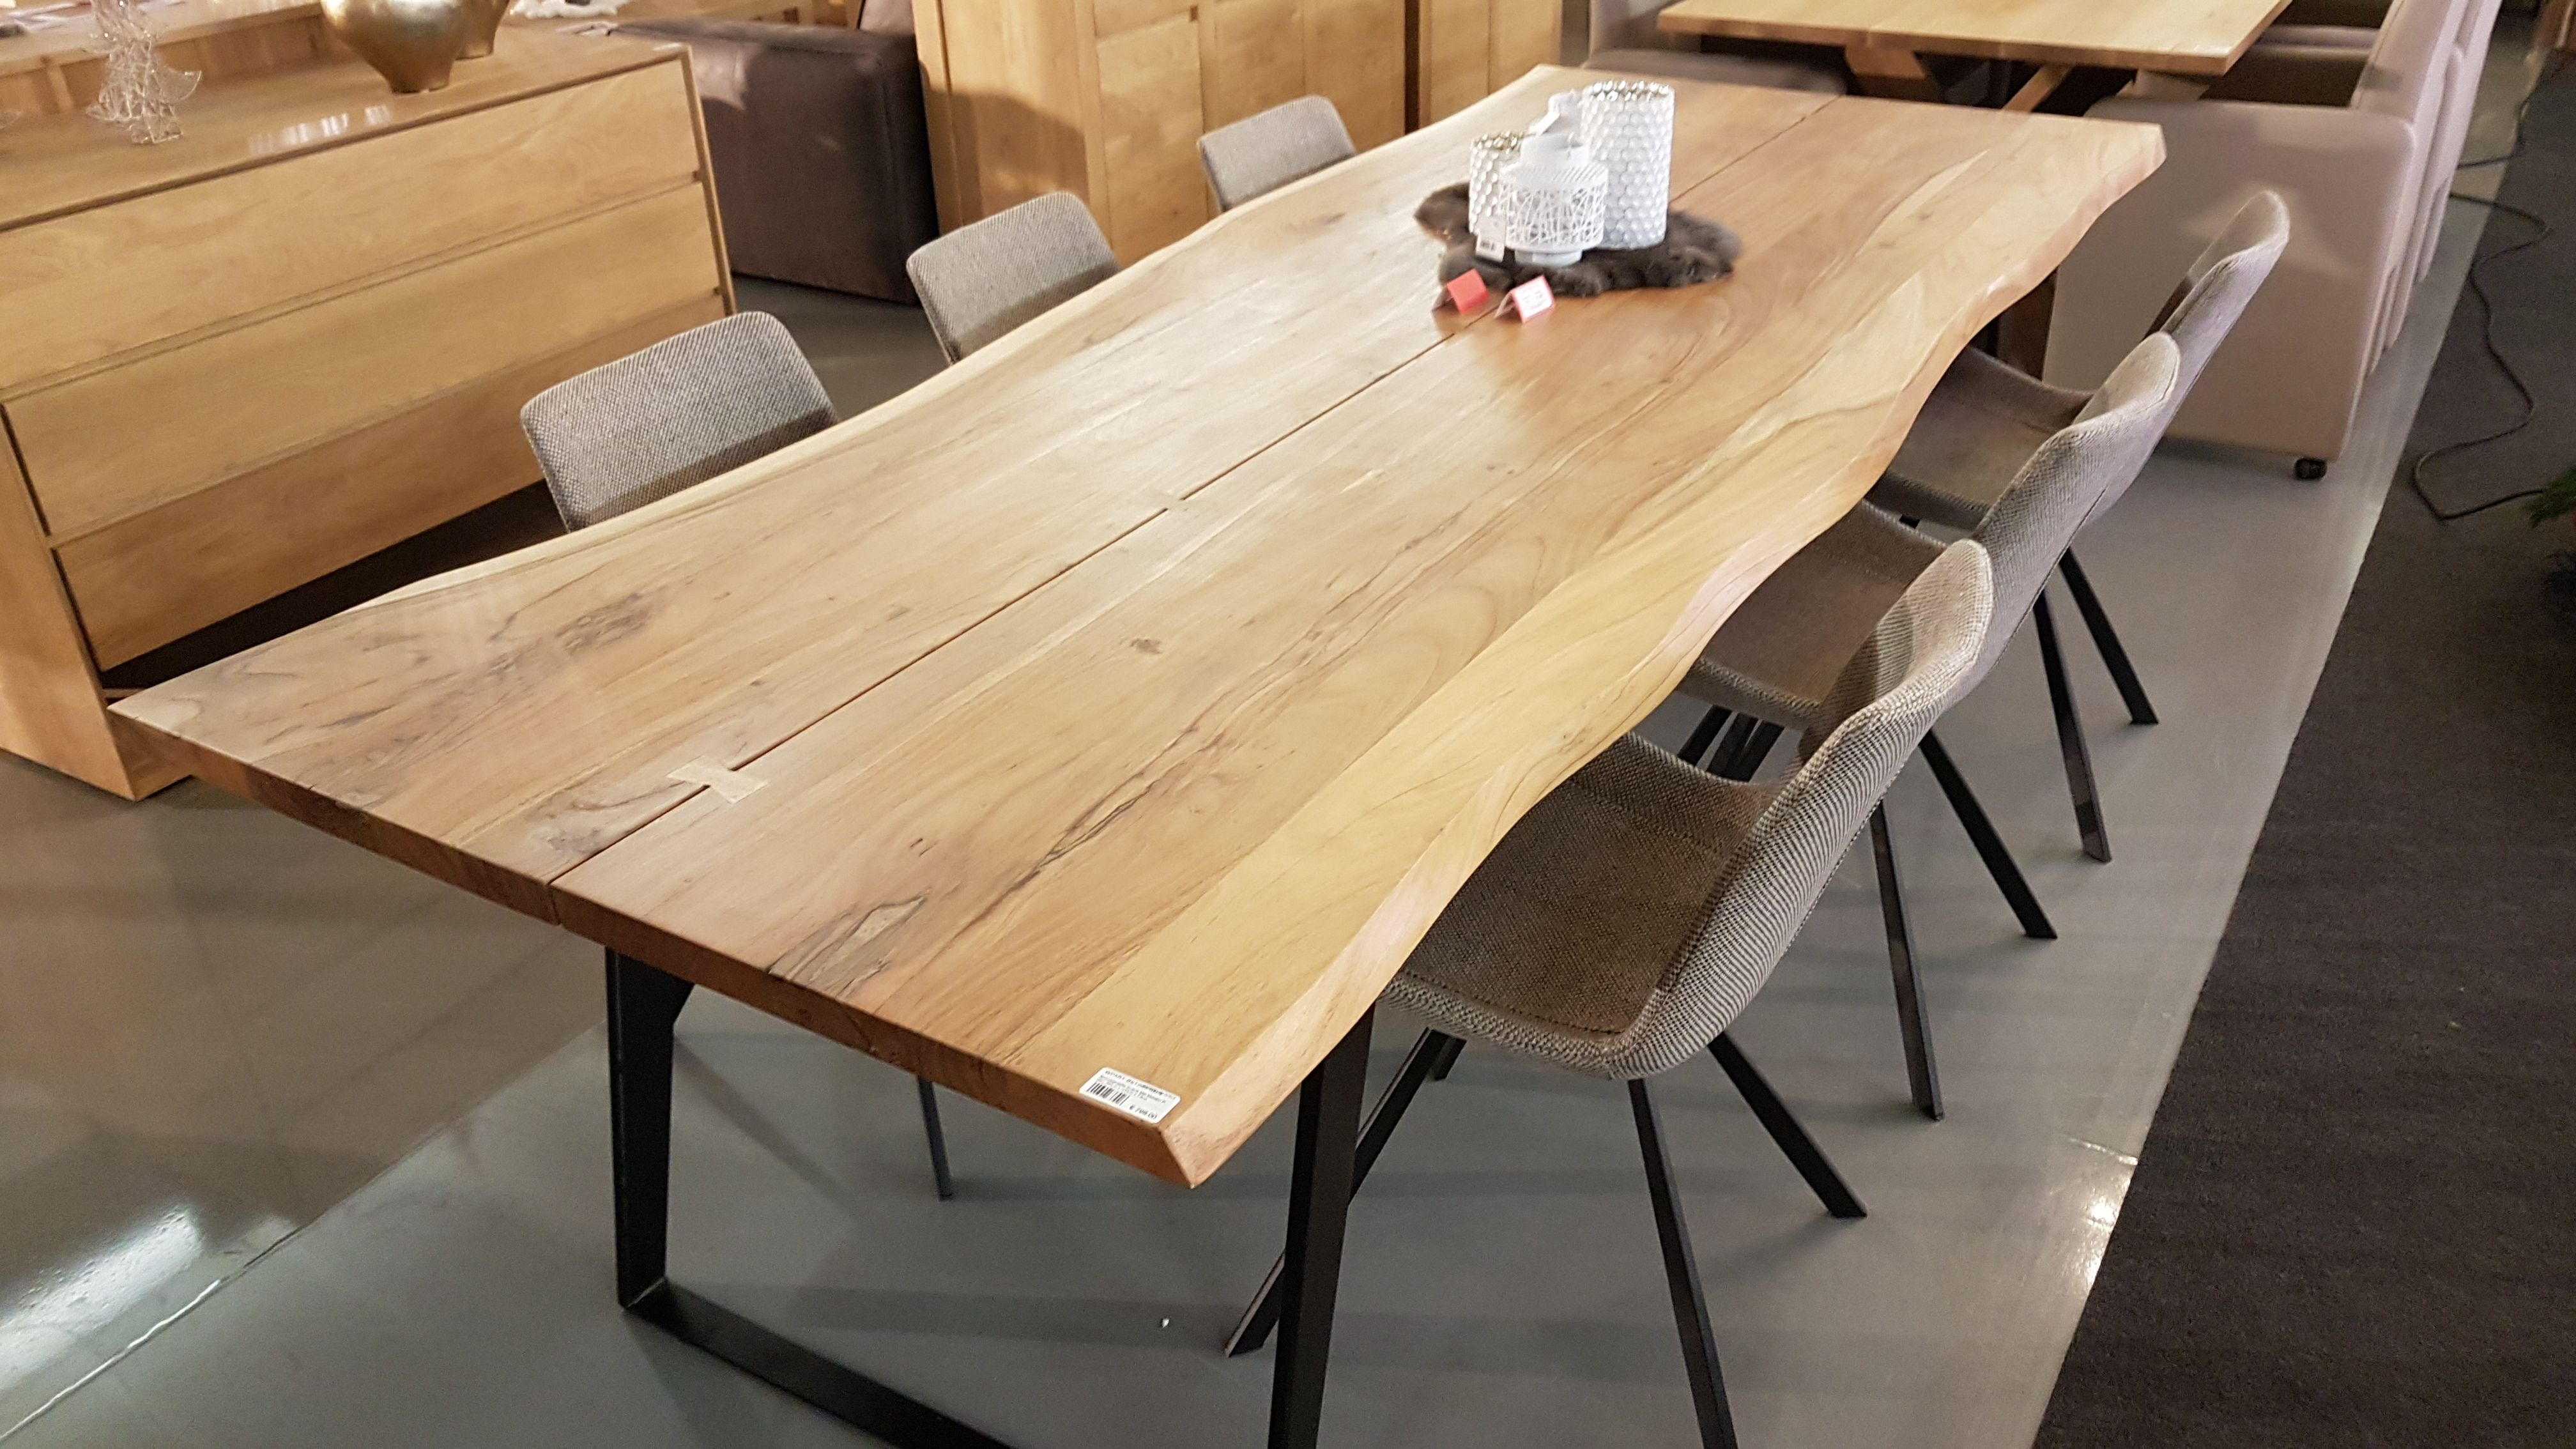 Trunk Table 260 L Eettafel Interieur Houten Tafel